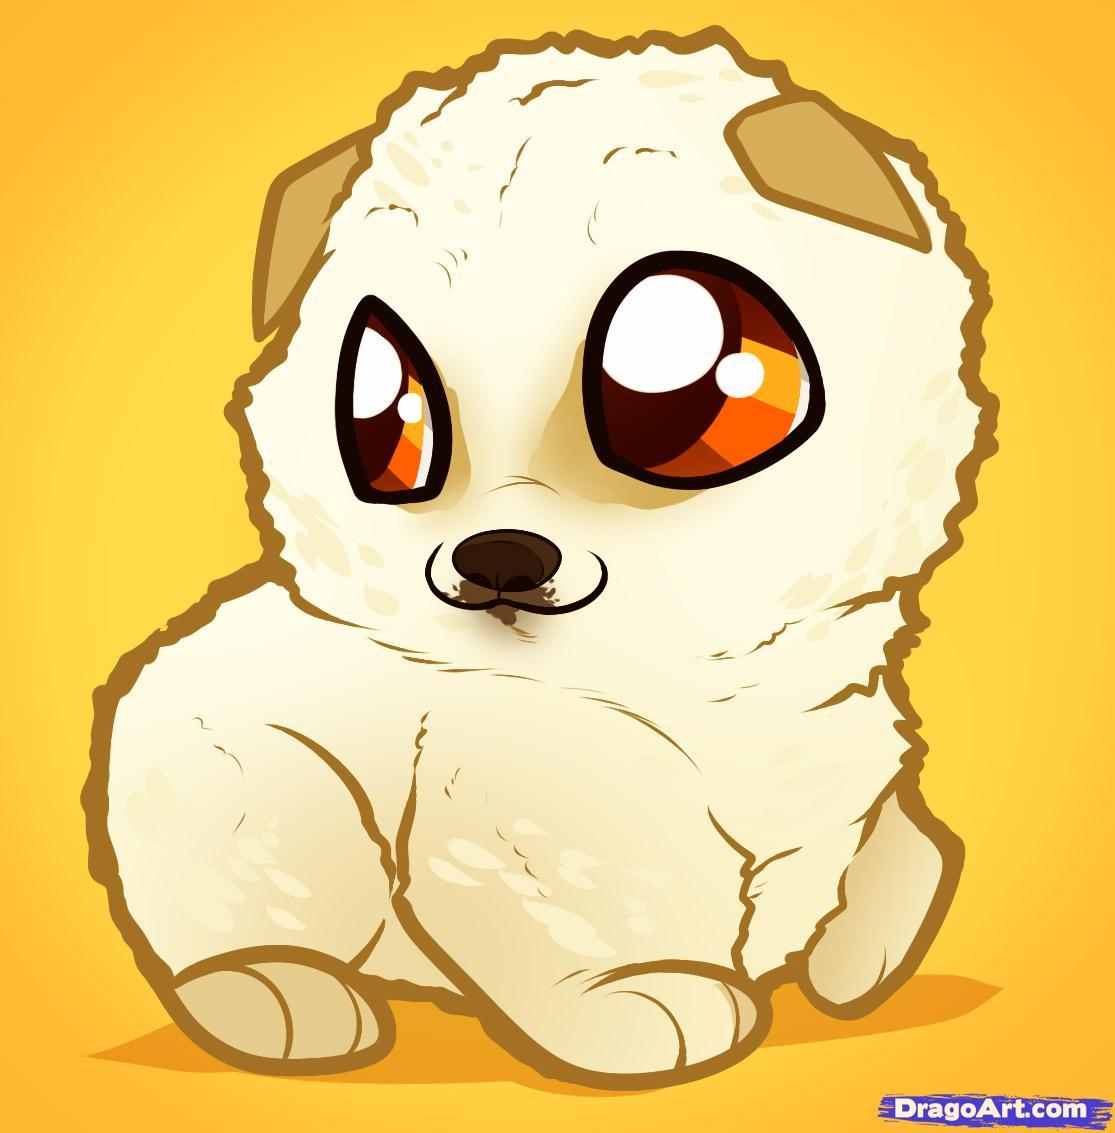 Drawn puppy dragoart A Puppy pomeranian how puppy